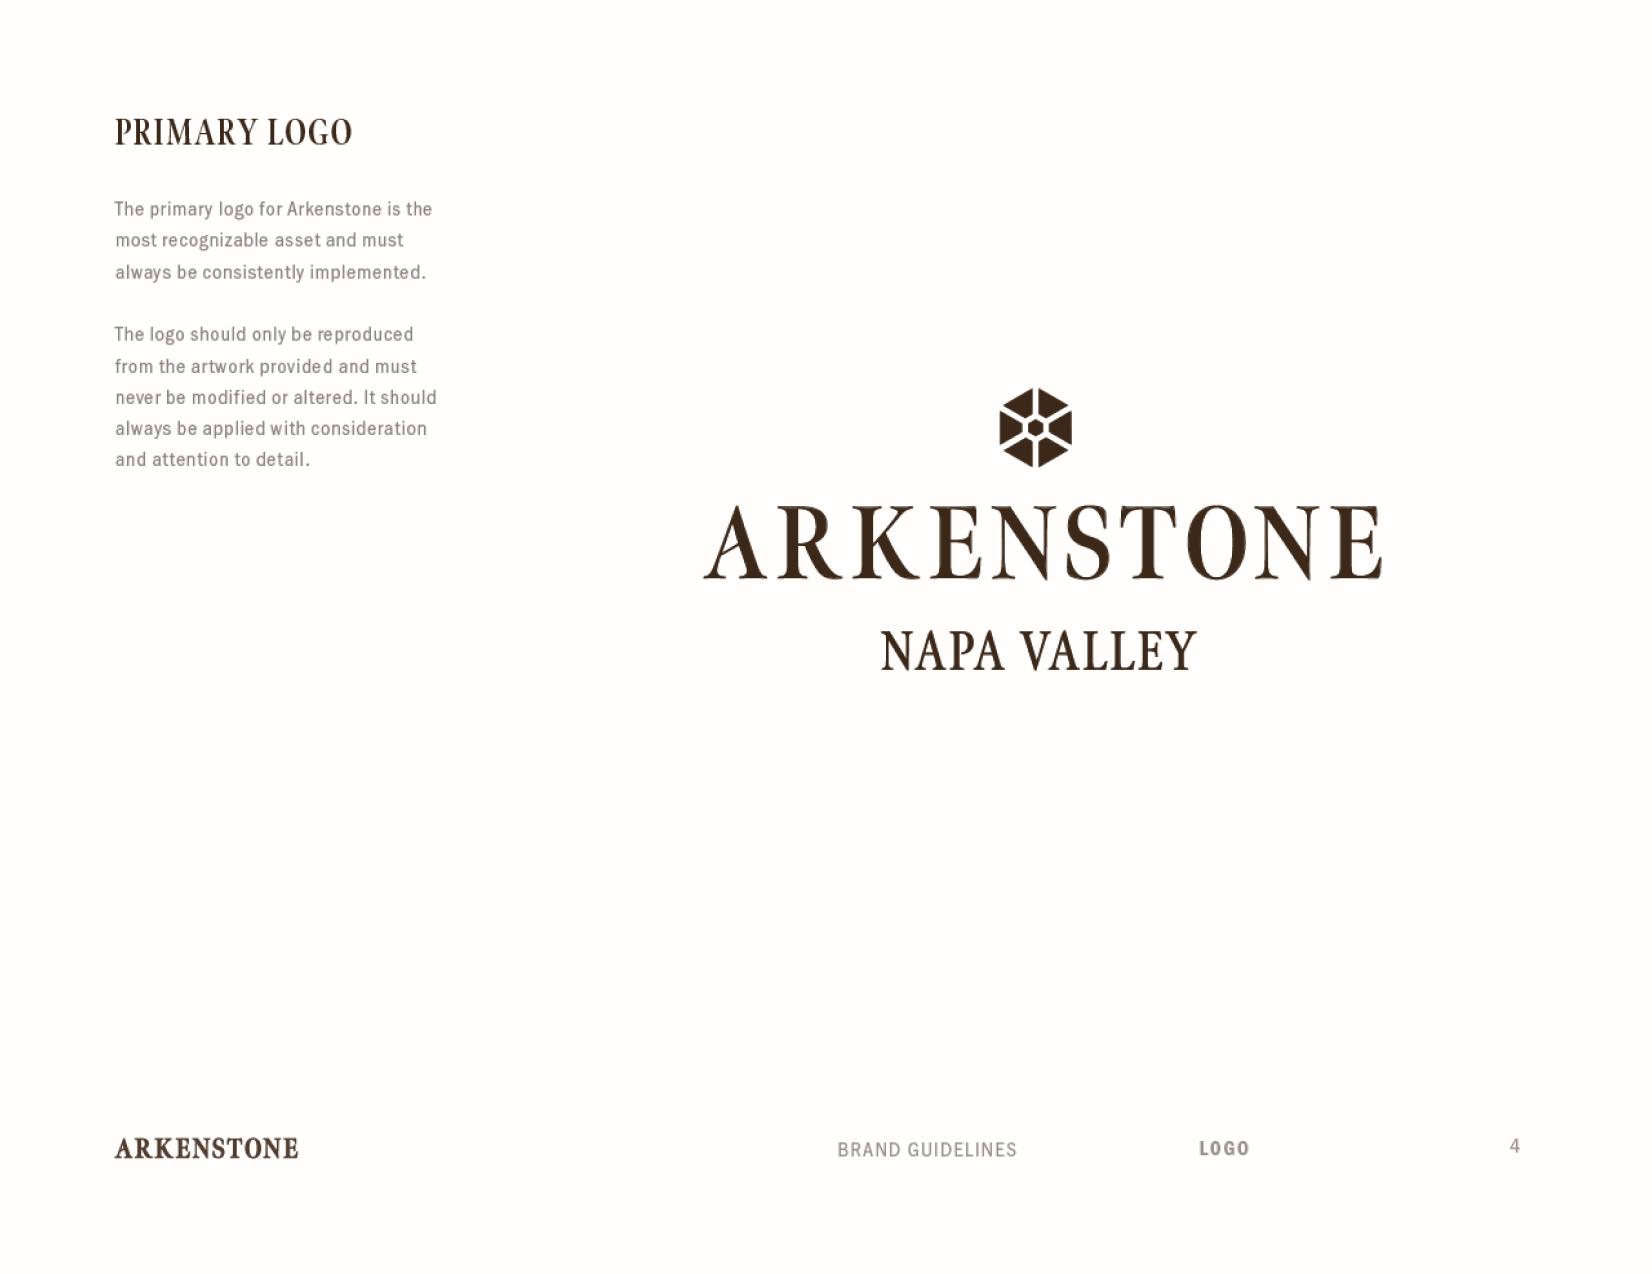 Arkenstone brand standards primary logo